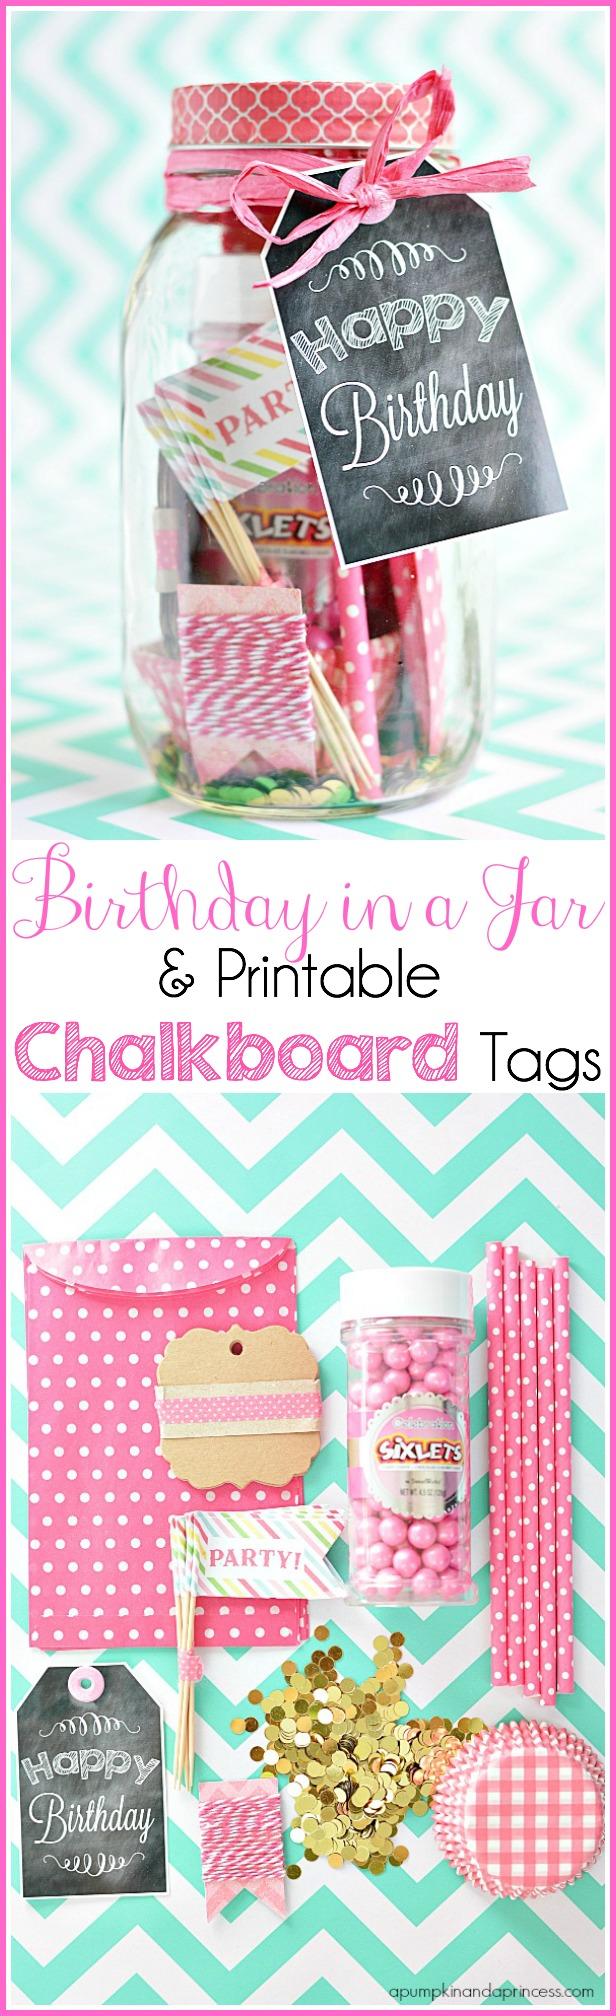 Mason jar birthday gift idea with printable tag